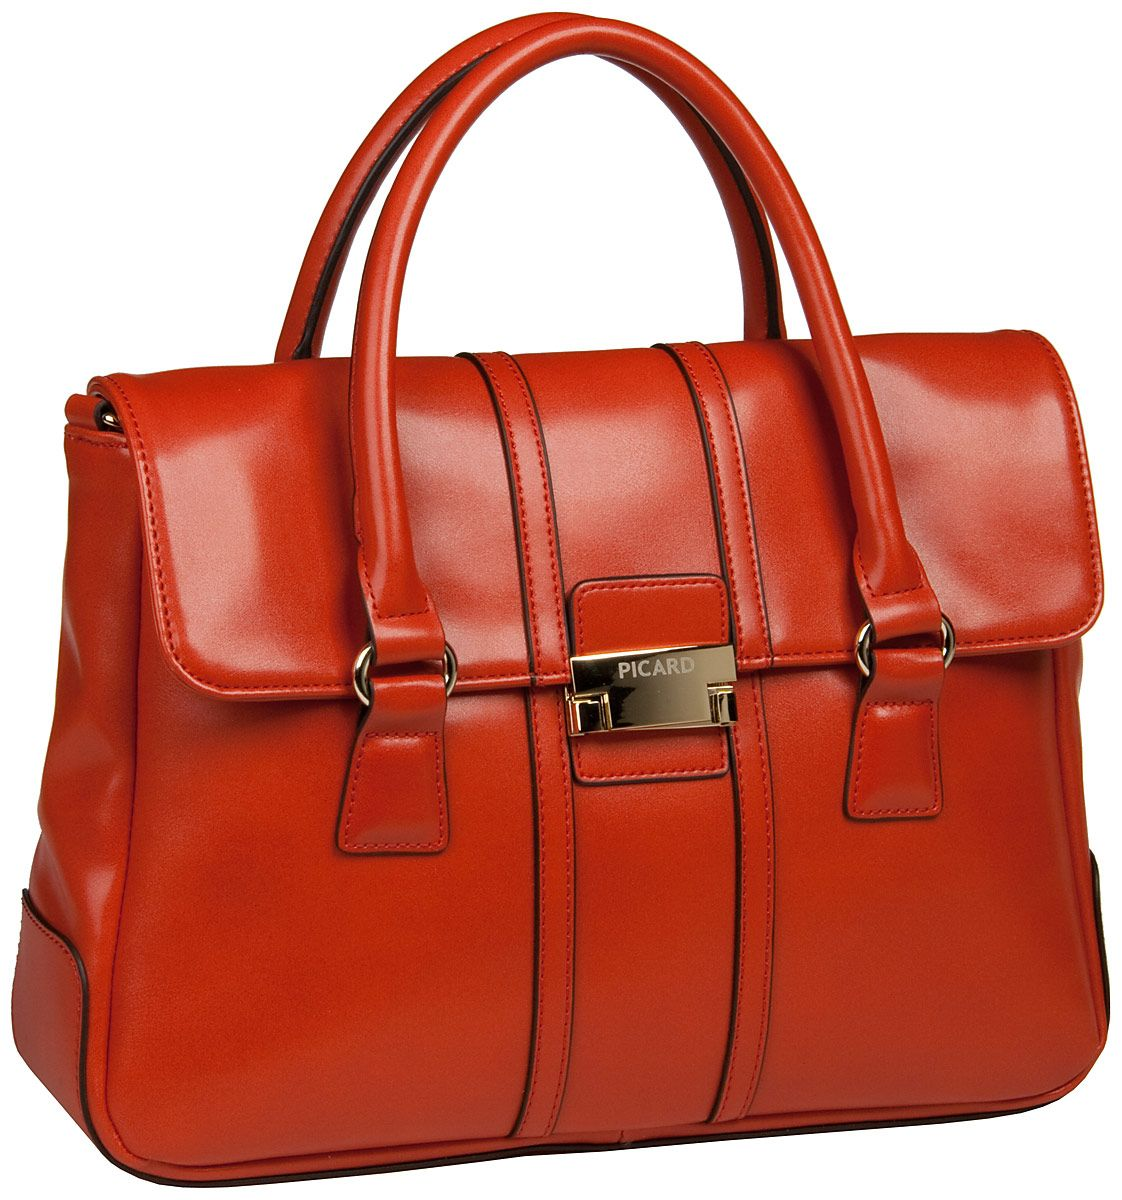 6eb4d54f81a86 Picard – Vanessa Handtasche Rot - Picard Vanessa Handtasche Rot Rote  Handtasche